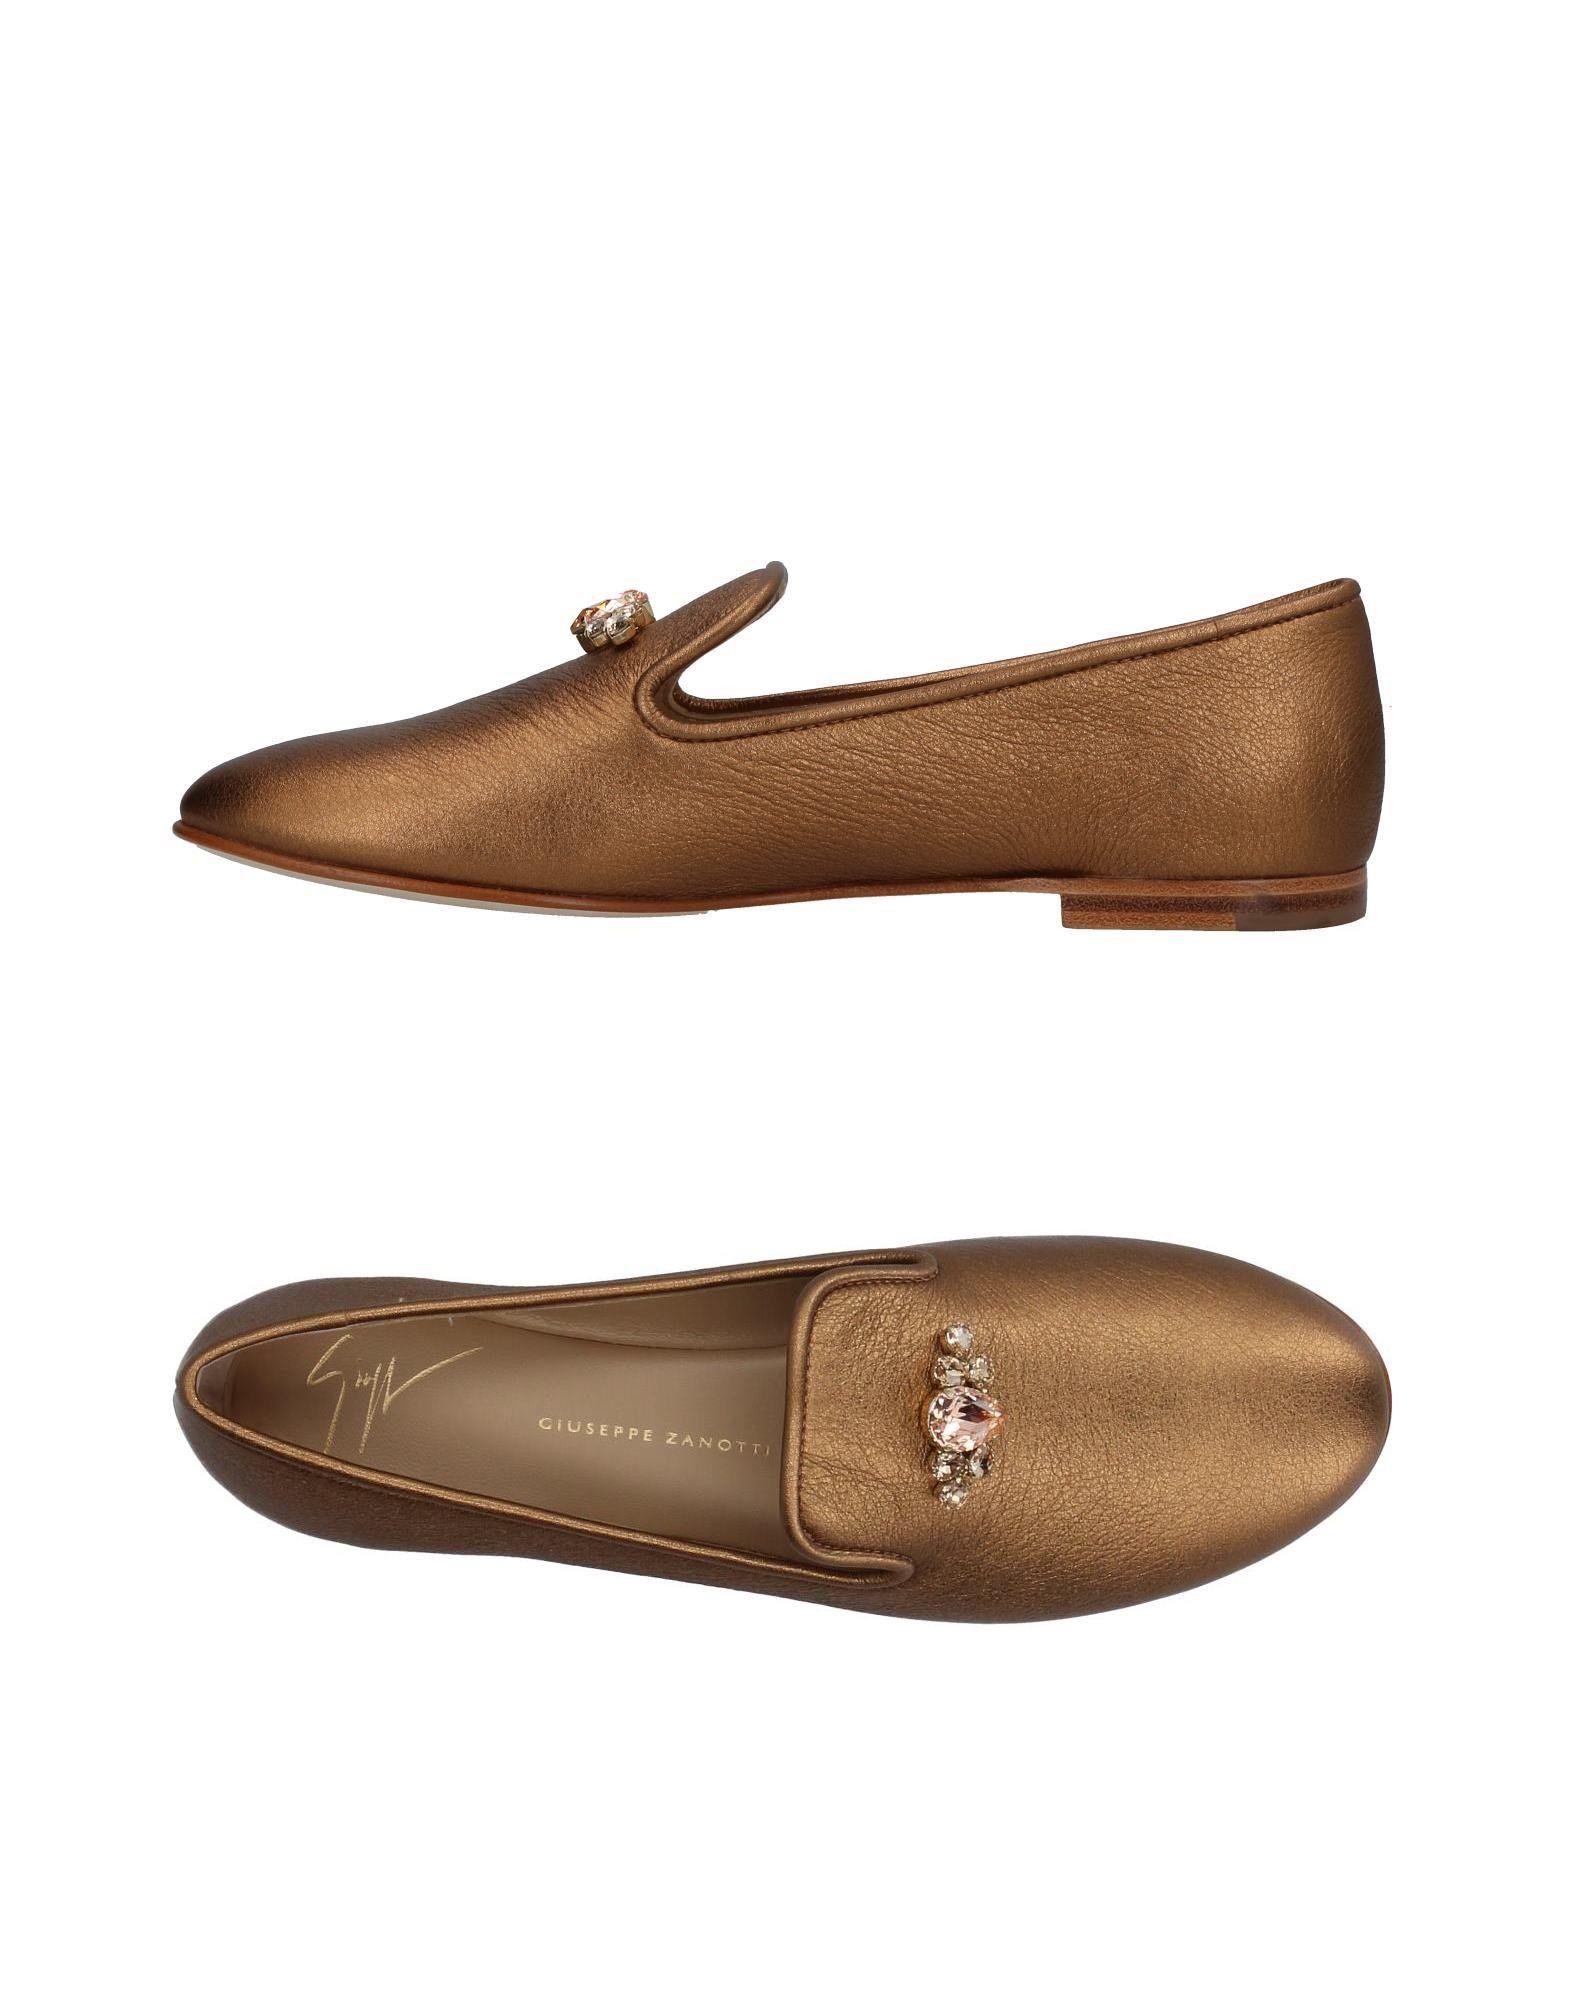 Giuseppe Zanotti Mokassins Damen  11394259RLGut aussehende strapazierfähige Schuhe